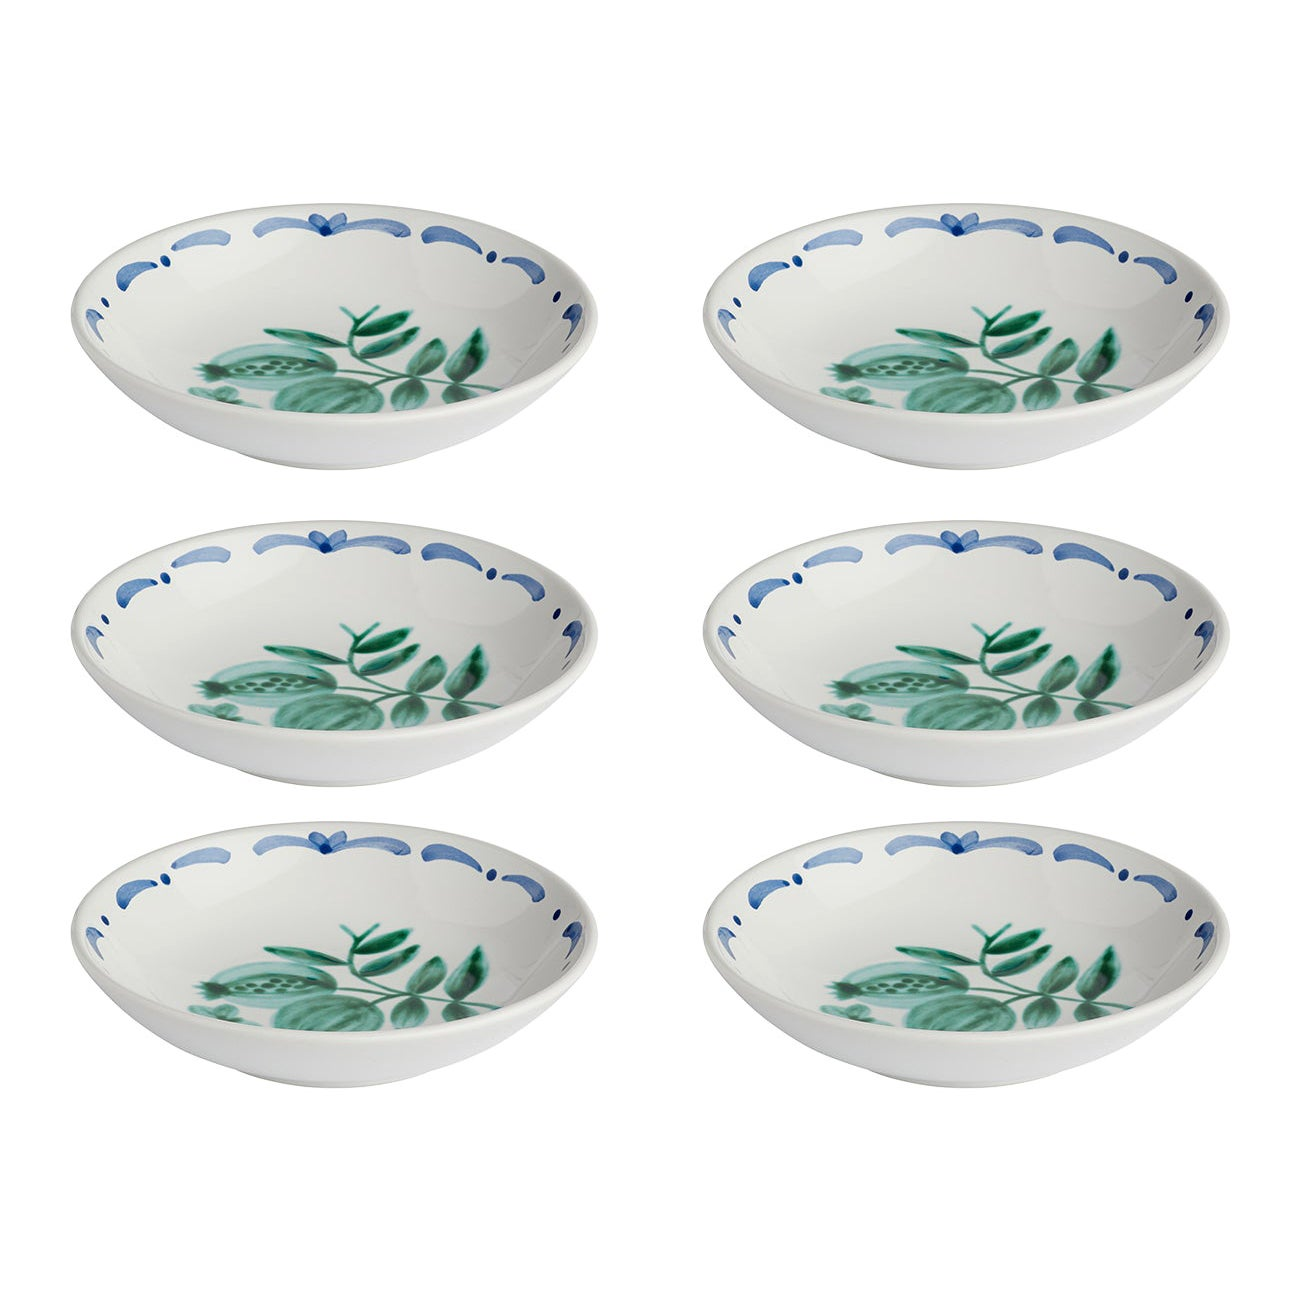 Set of Six Hand-Painted Ceramic Dishes Sofina Boutique Kitzbühel Austria